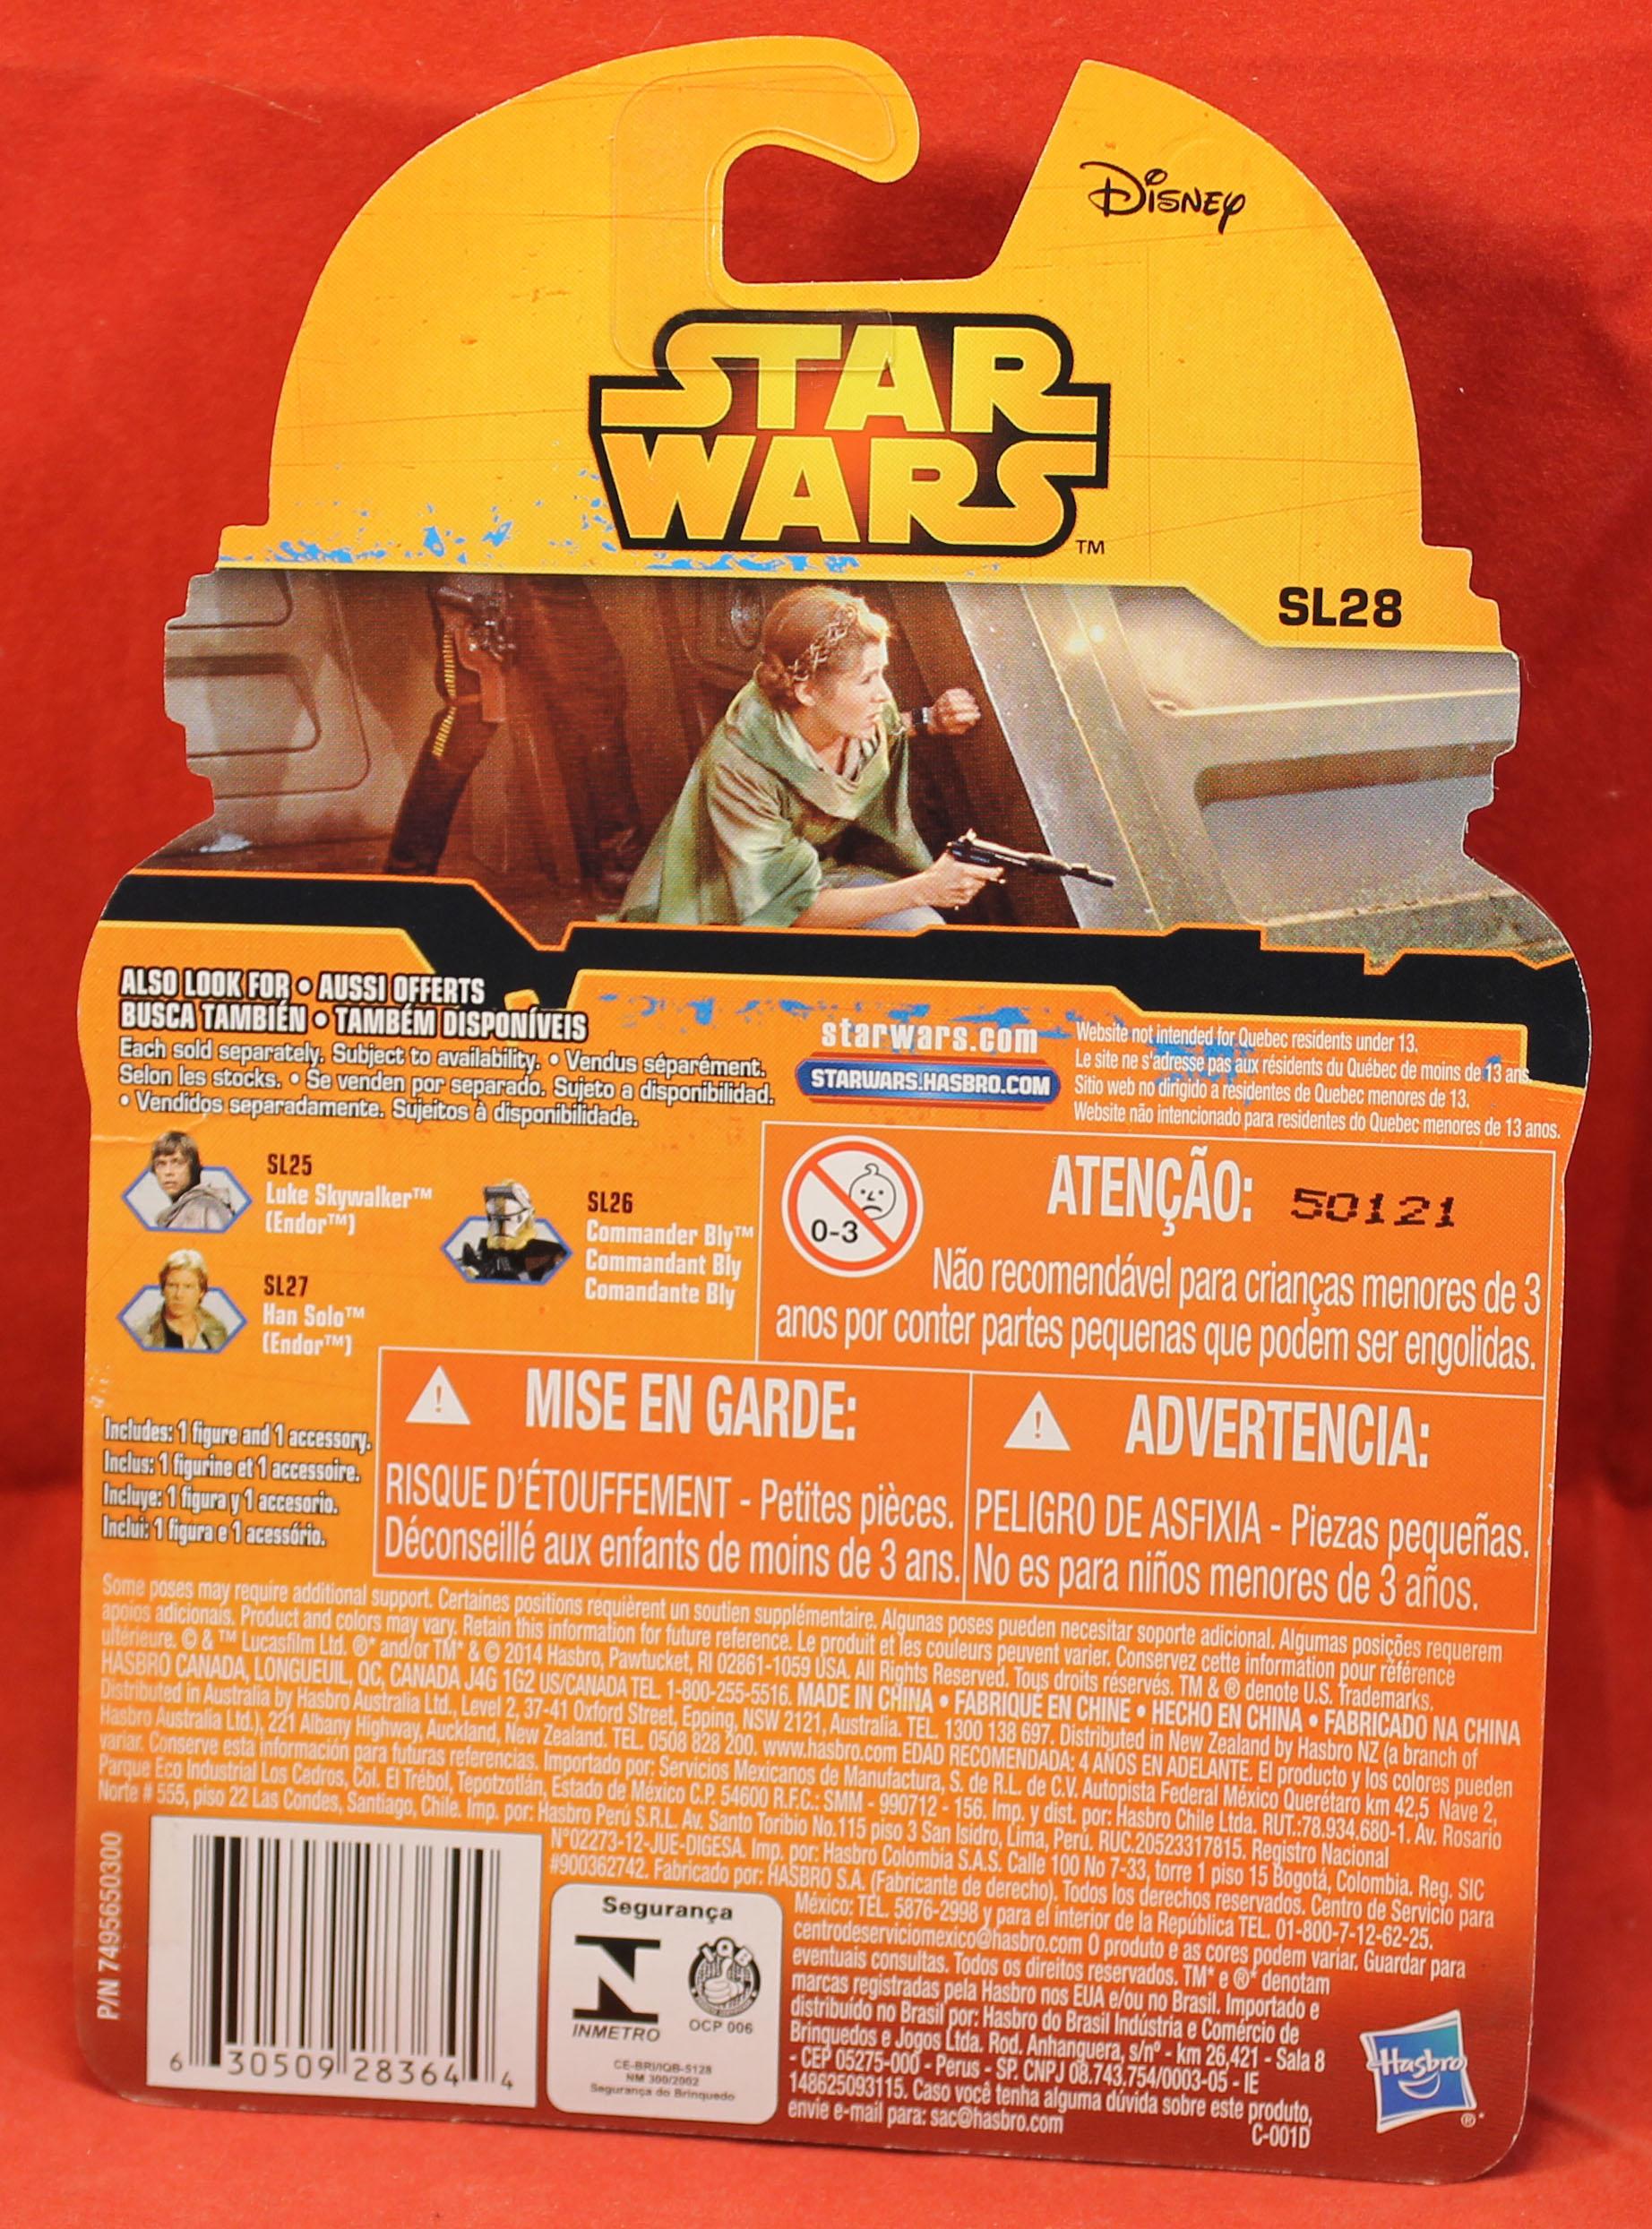 Princess Leia Endor Star Wars Saga Legends SL28 action figure